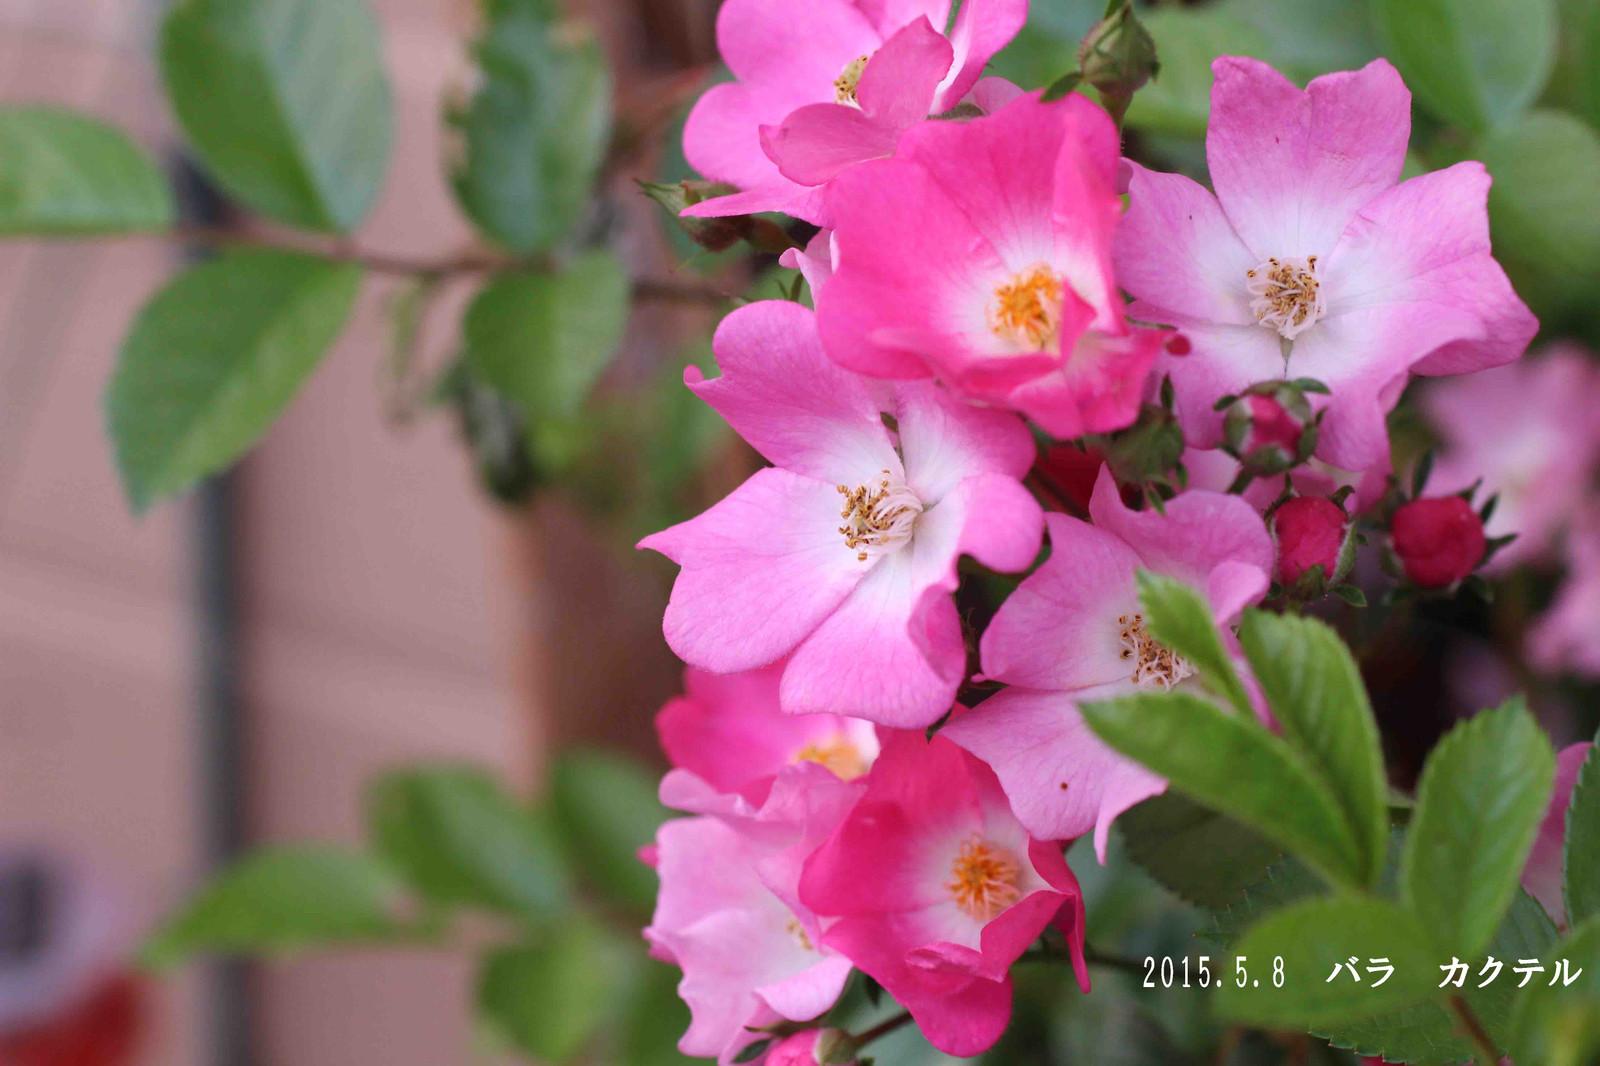 2015_05_09_9200_edited1